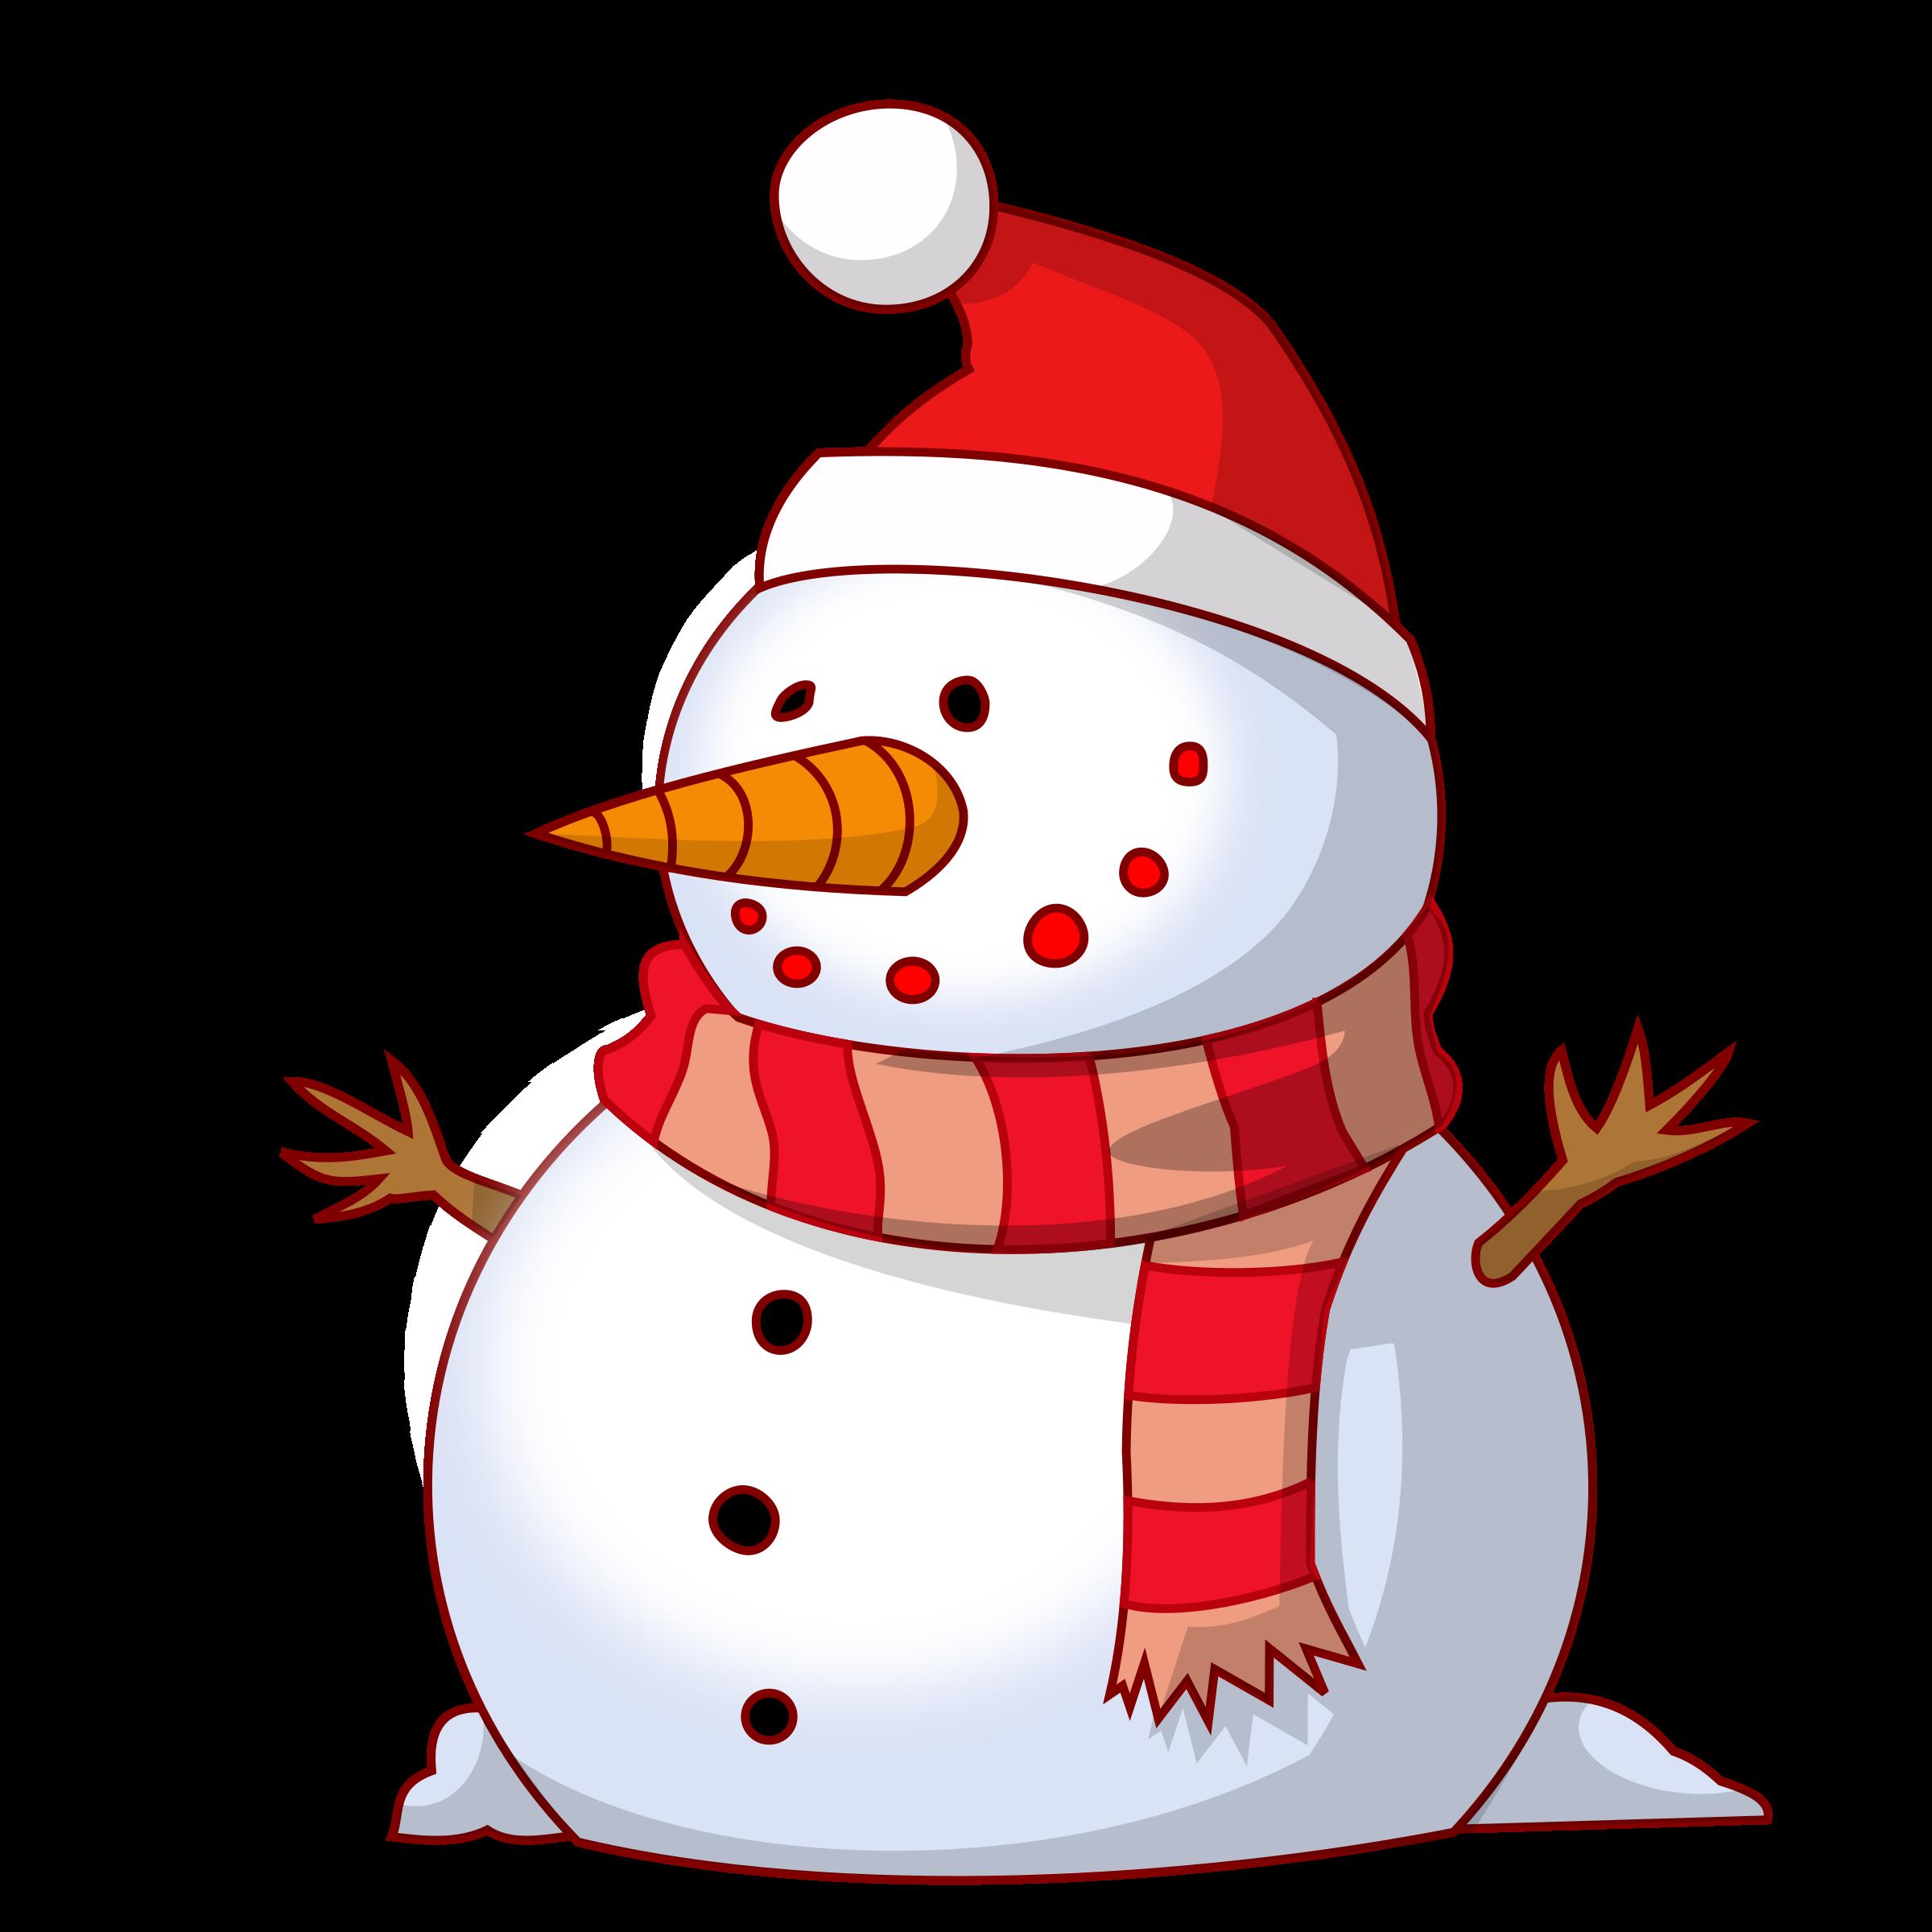 Clipart snowman basic, Clipart snowman basic Transparent.